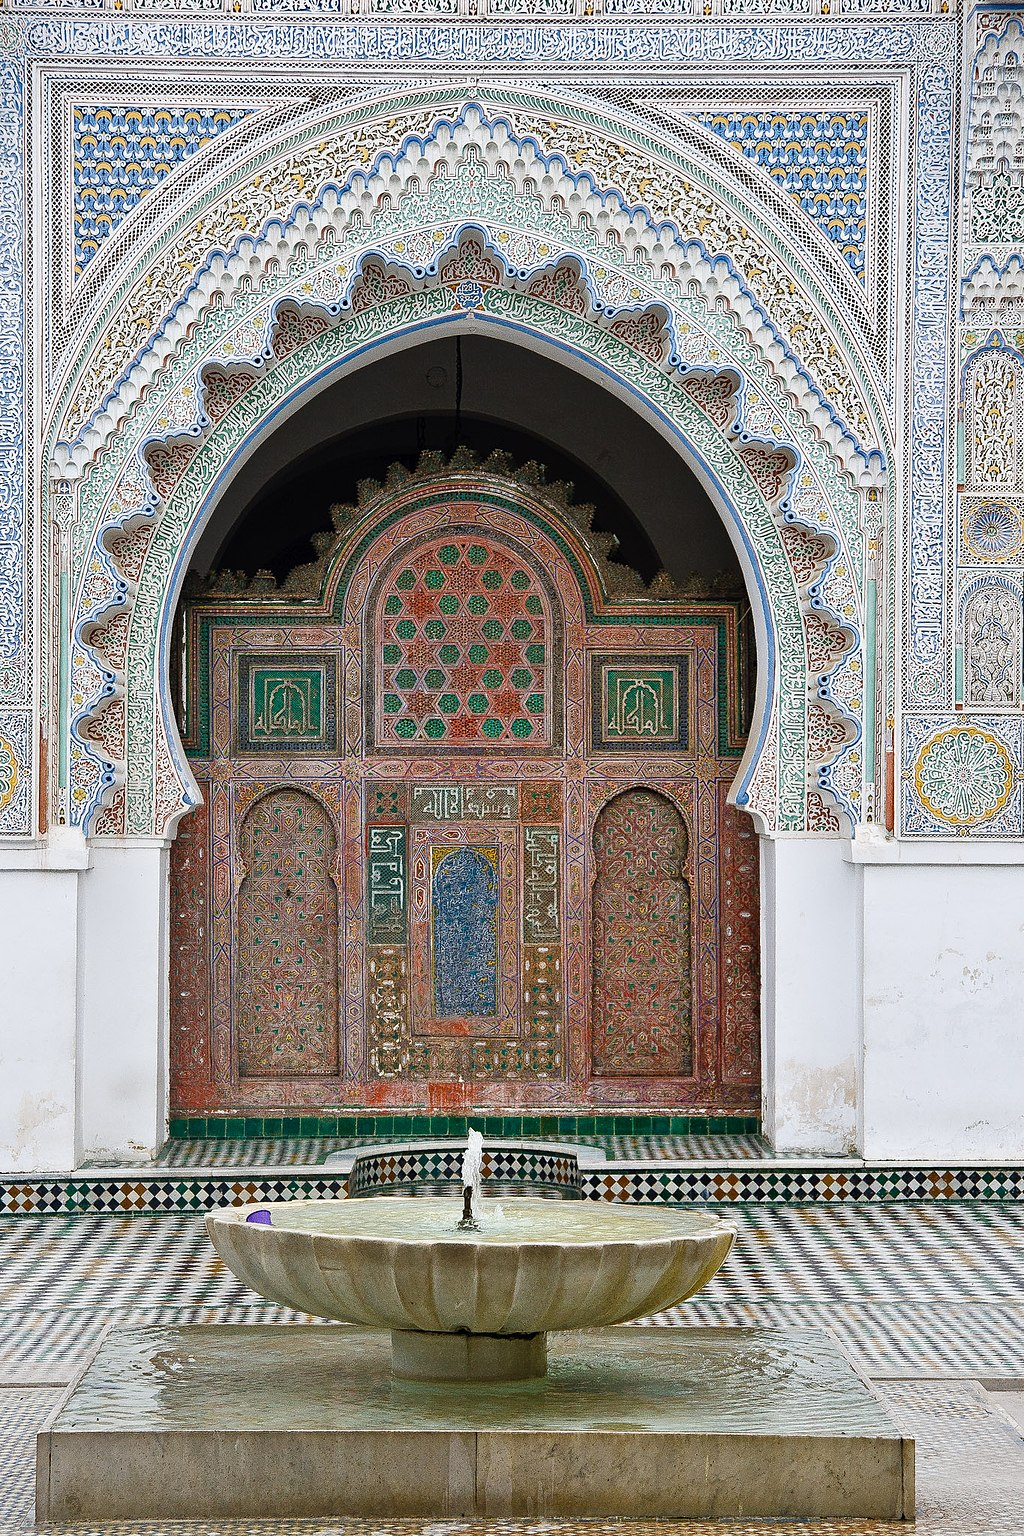 University of Qarawiyyin fountain